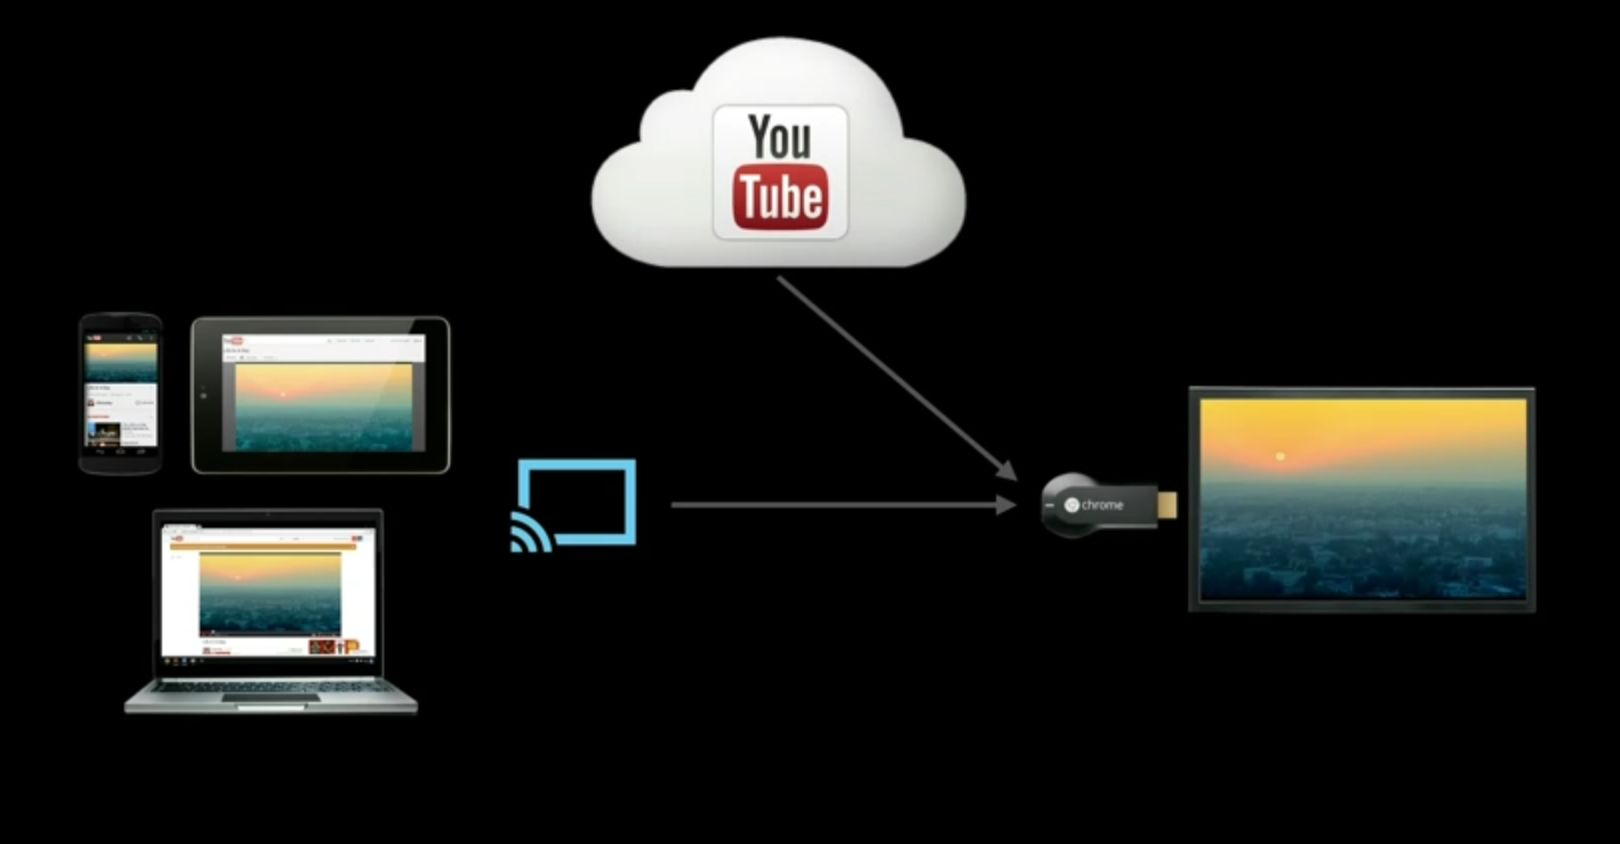 Chromecast cloud